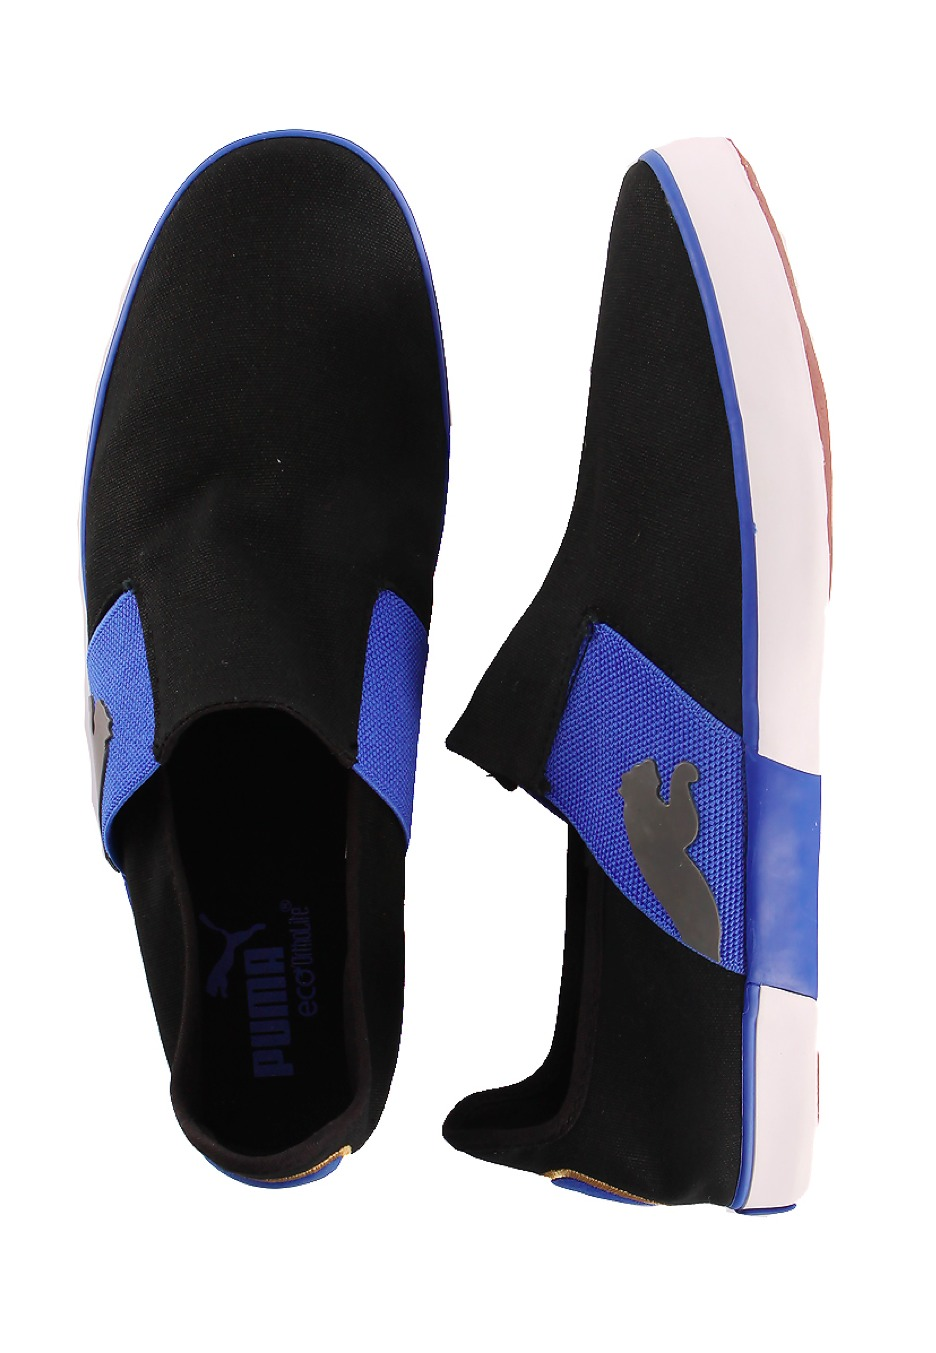 Puma - Lazy Slip-On Black/Dazzling Blue